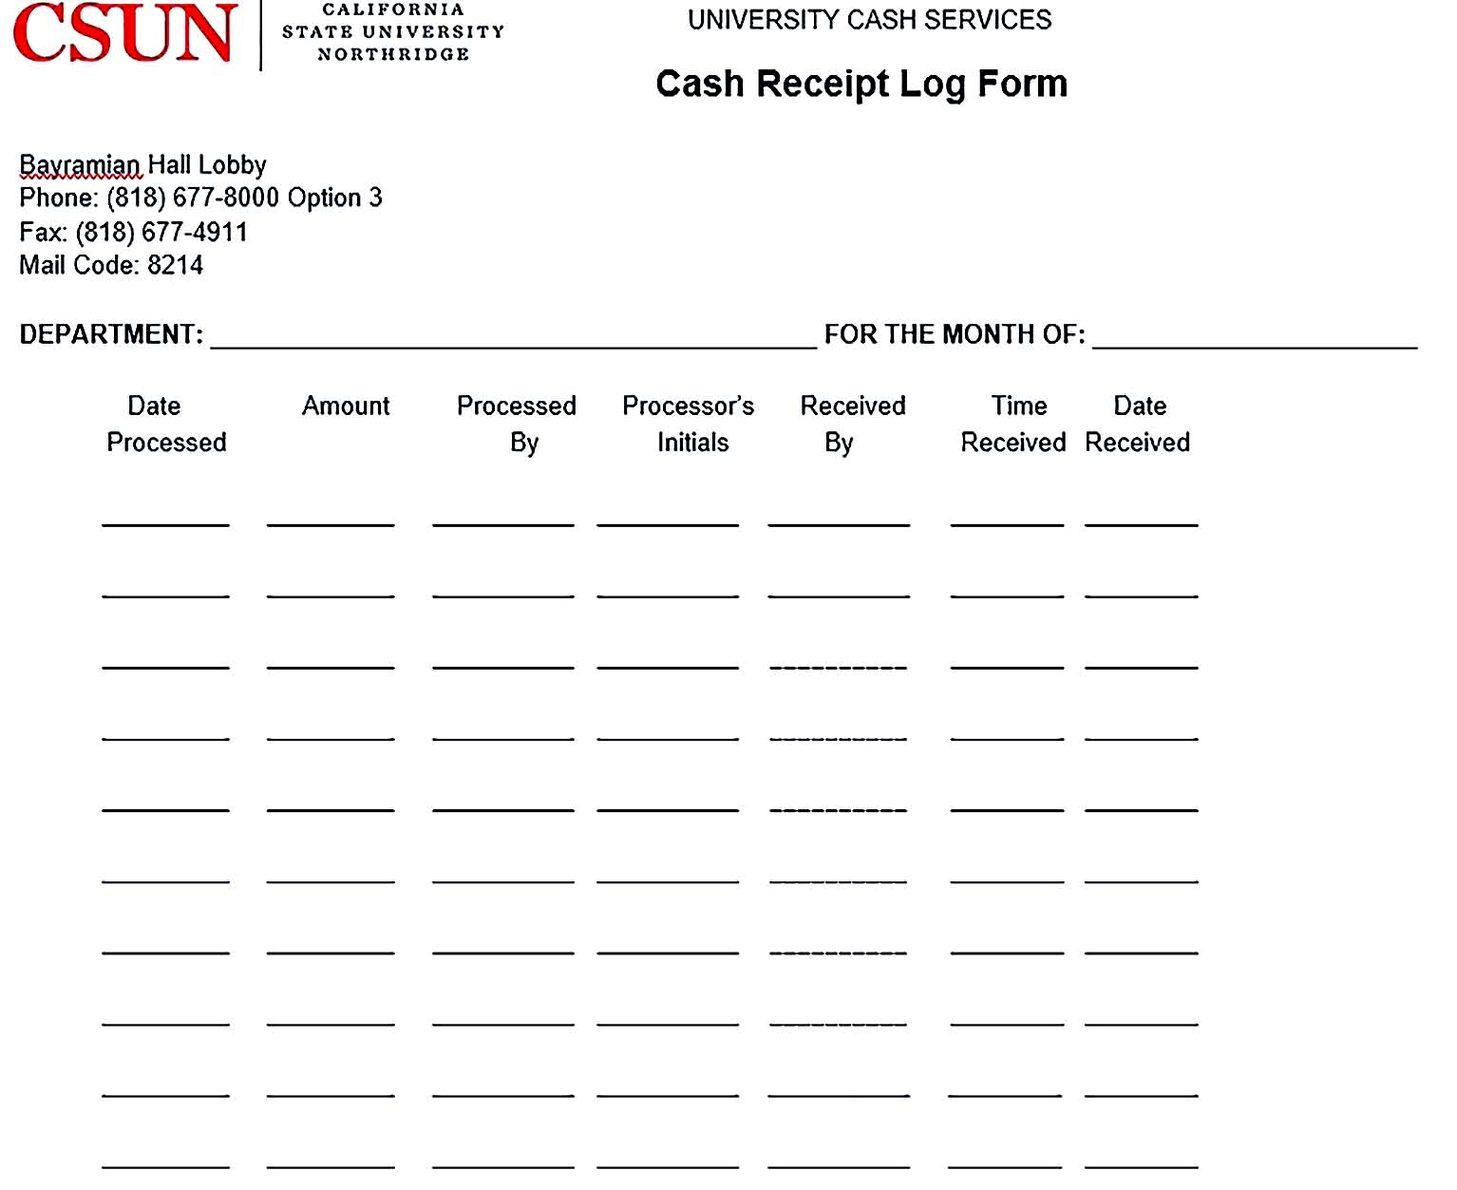 Cash Receipt Log Form